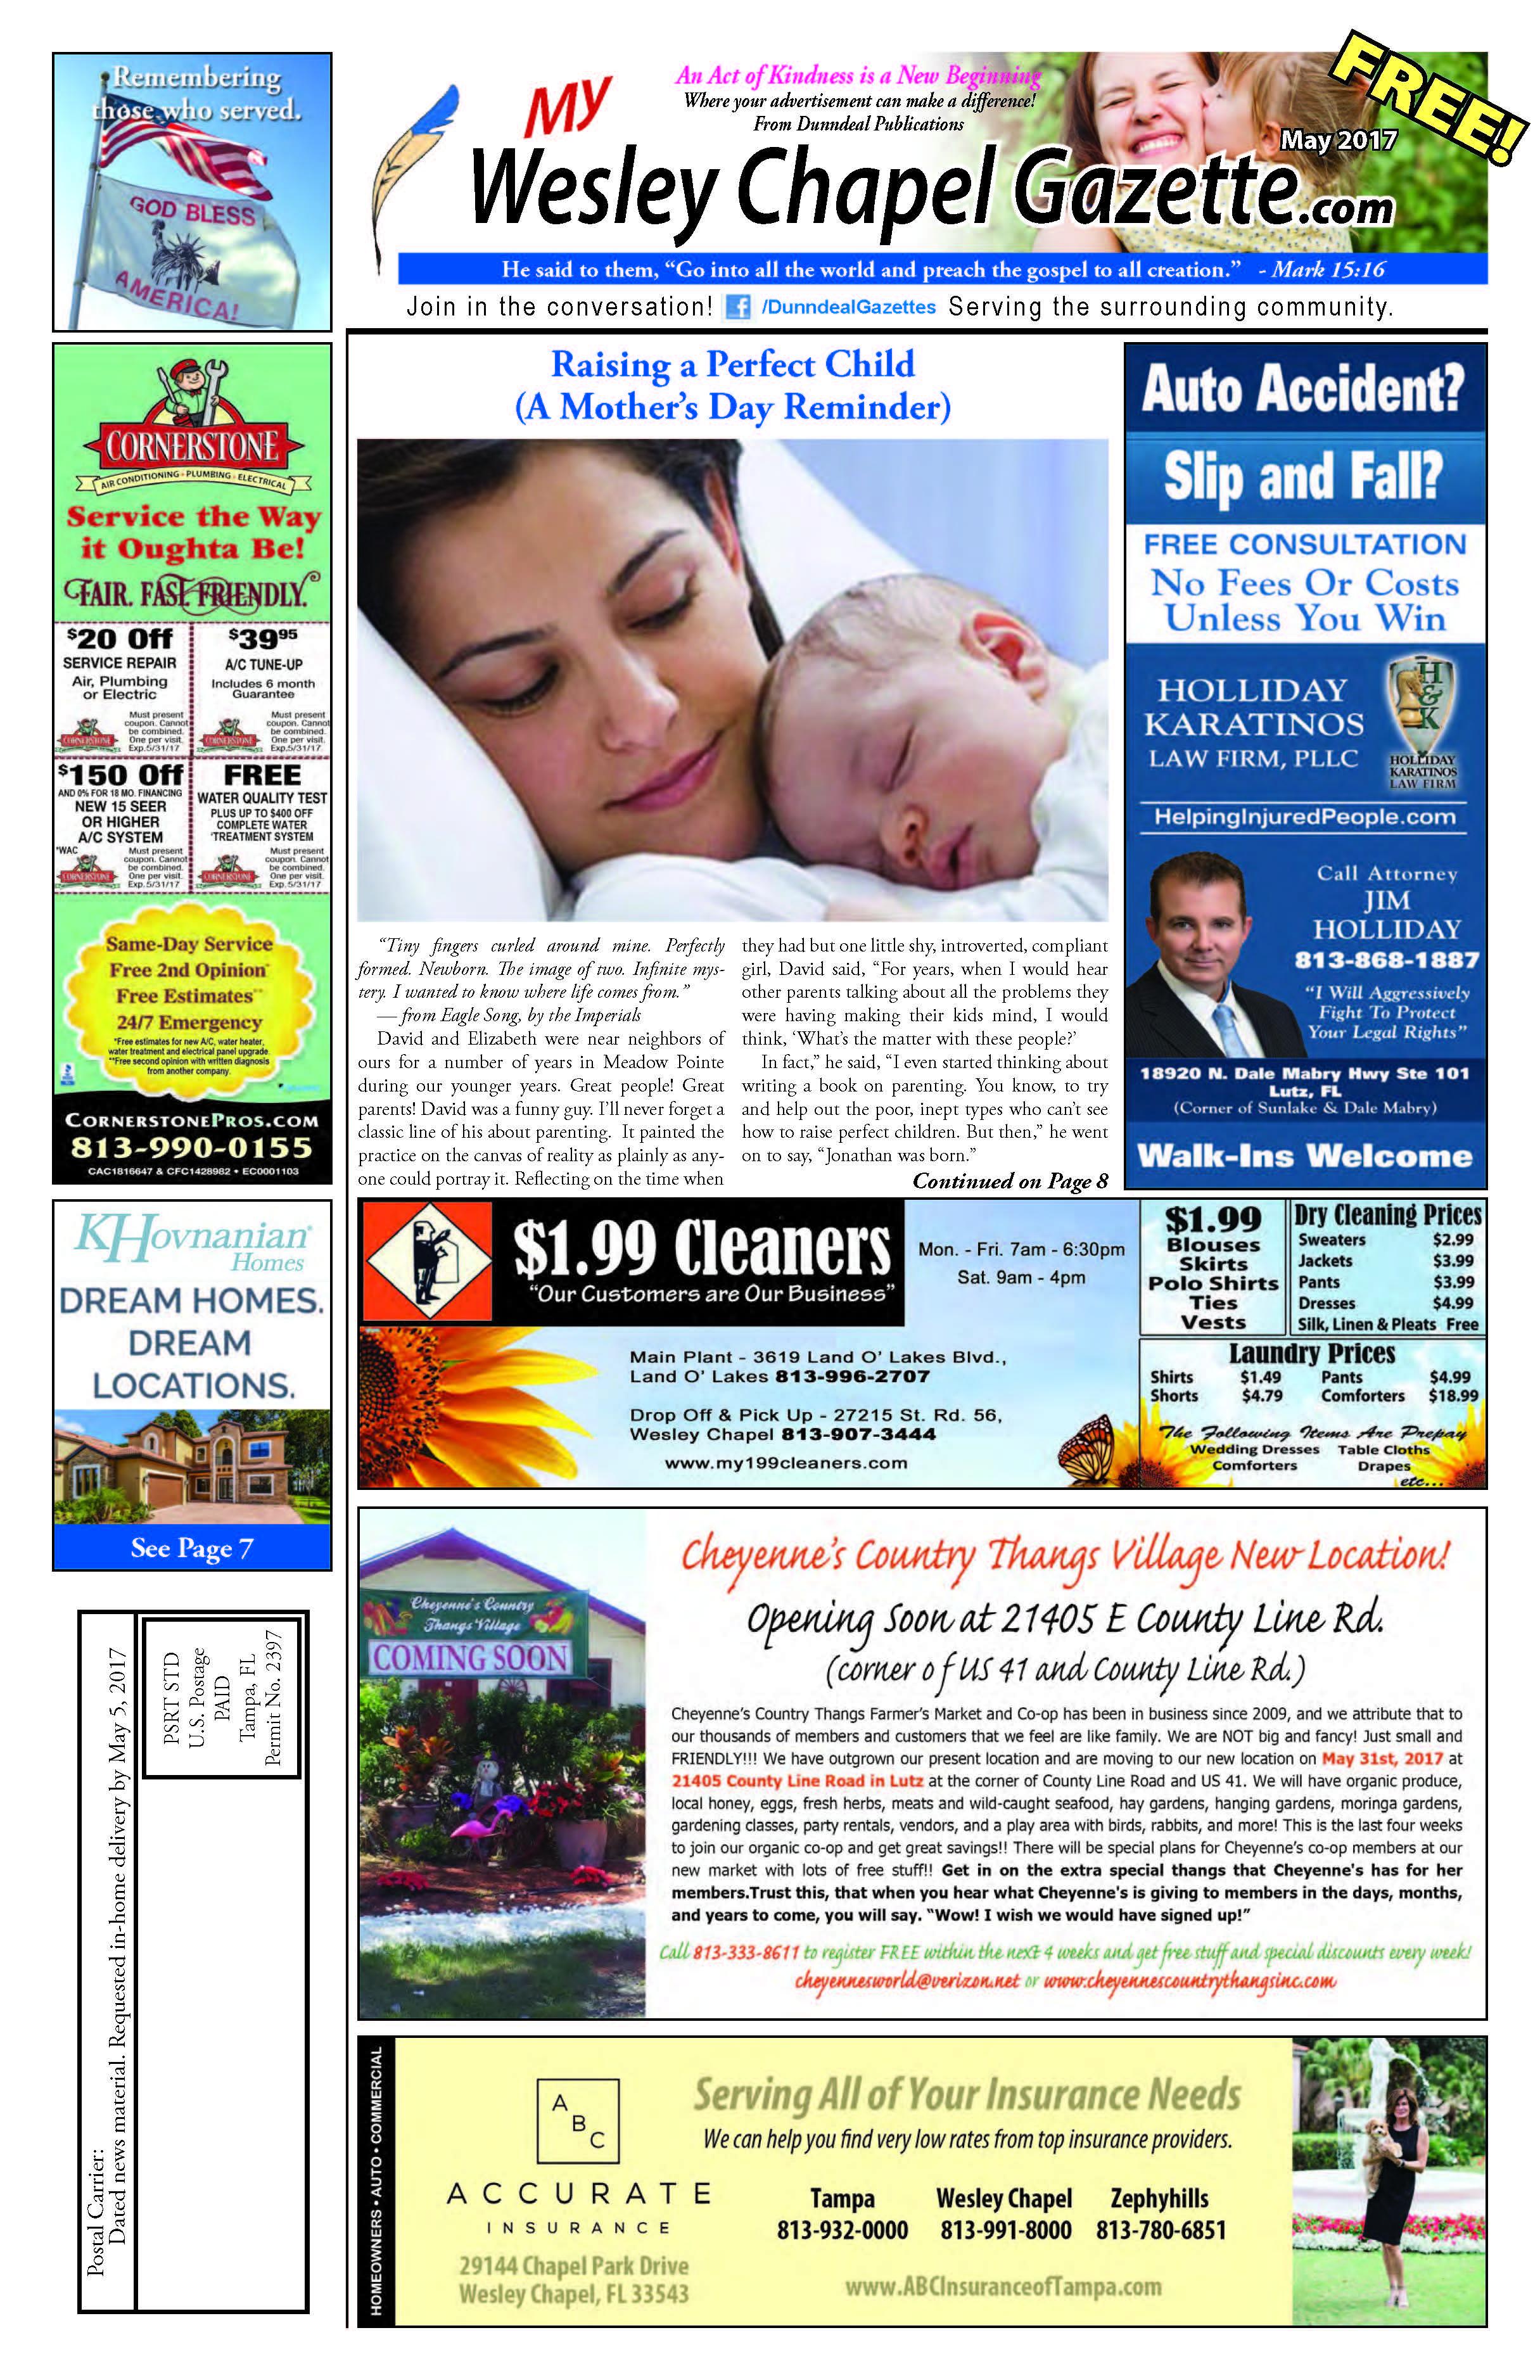 Wesley-Chapel-Gazette-May-2017-p1-1.jpg